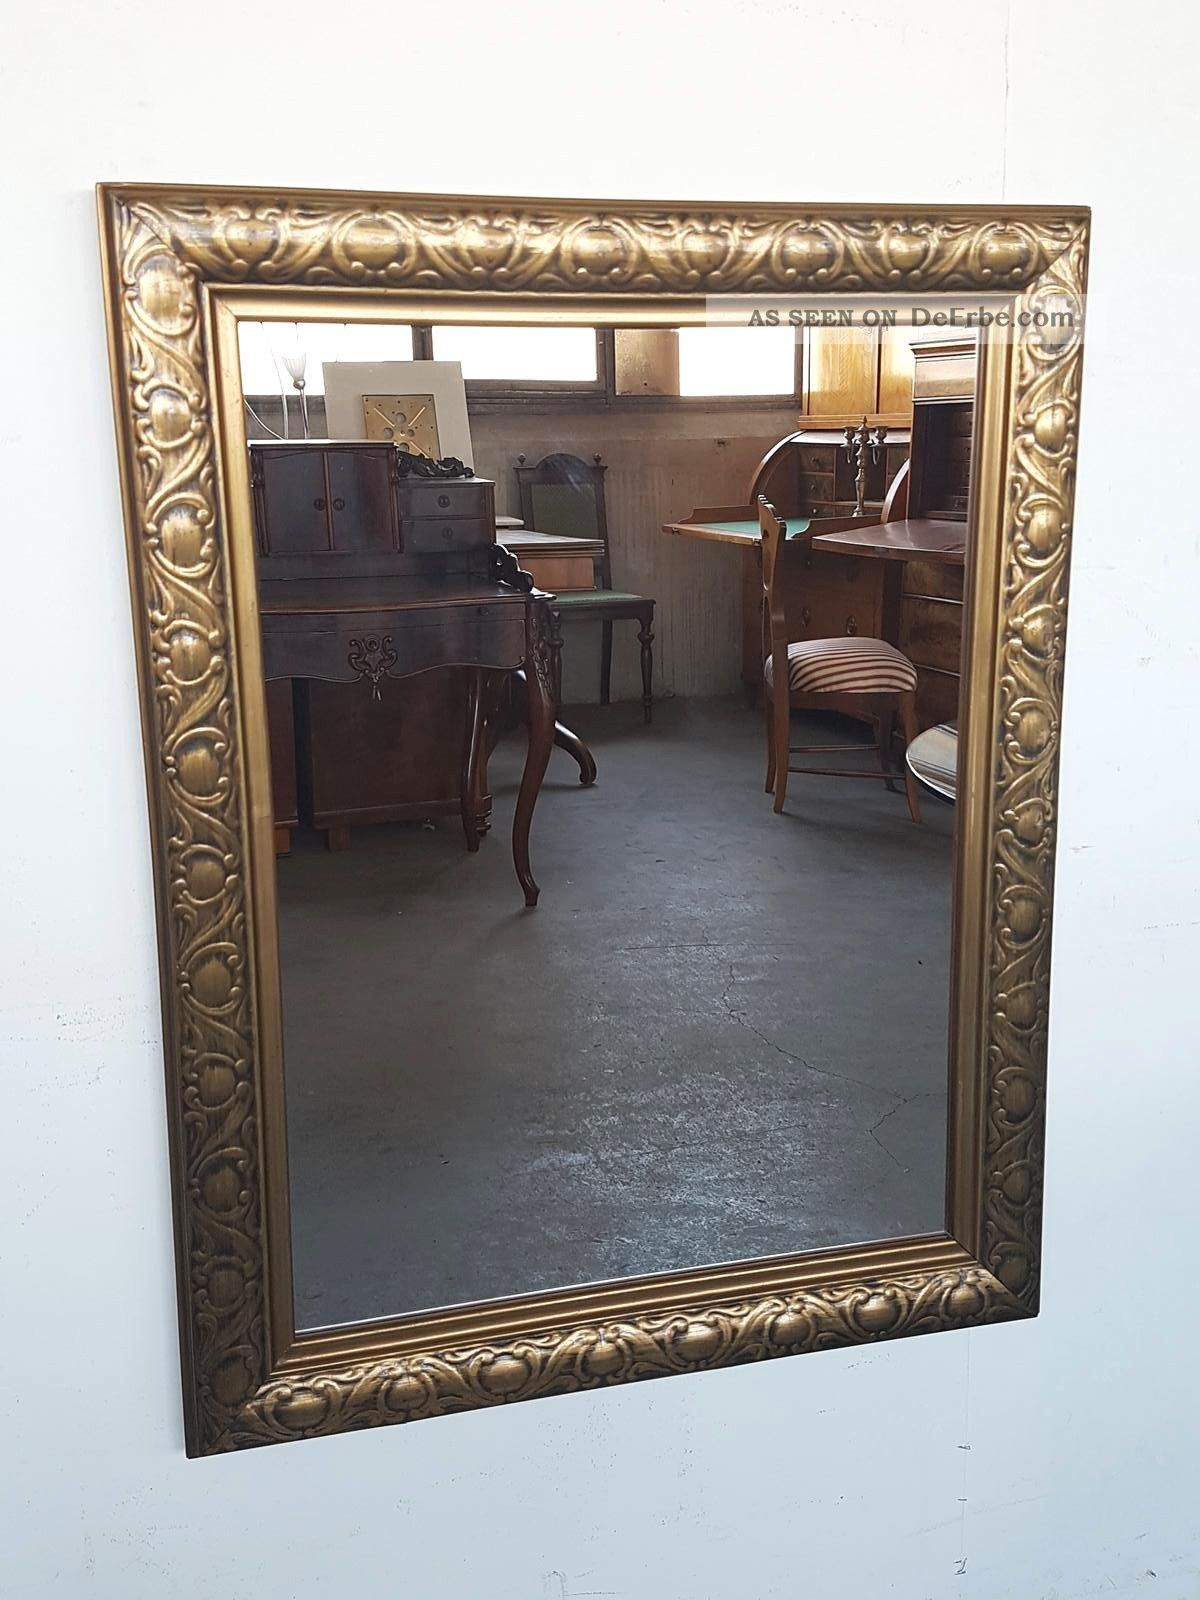 wandspiegel rahmen mit vergoldeten ornamenten um 1910. Black Bedroom Furniture Sets. Home Design Ideas